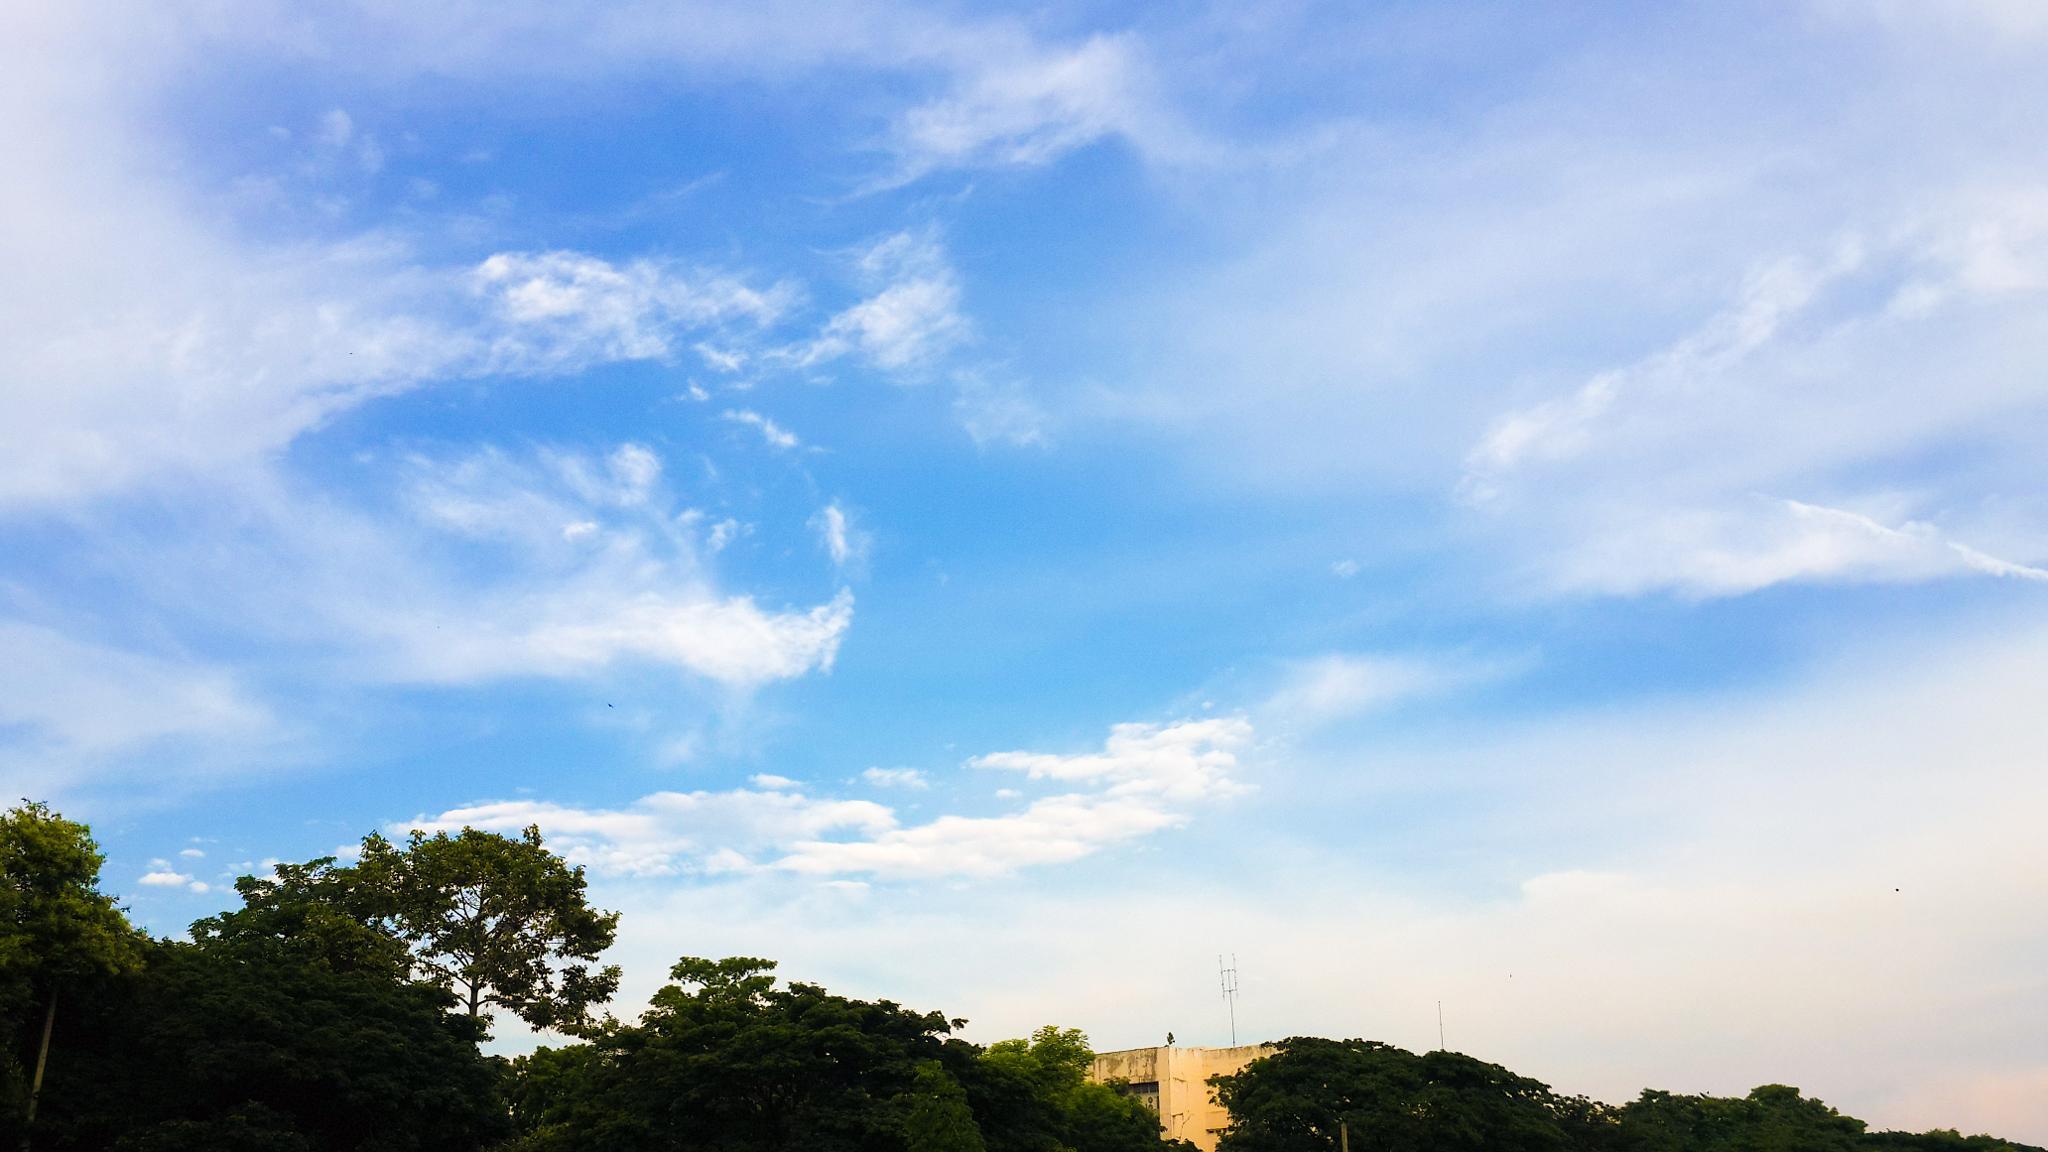 Nice sky by kp2609